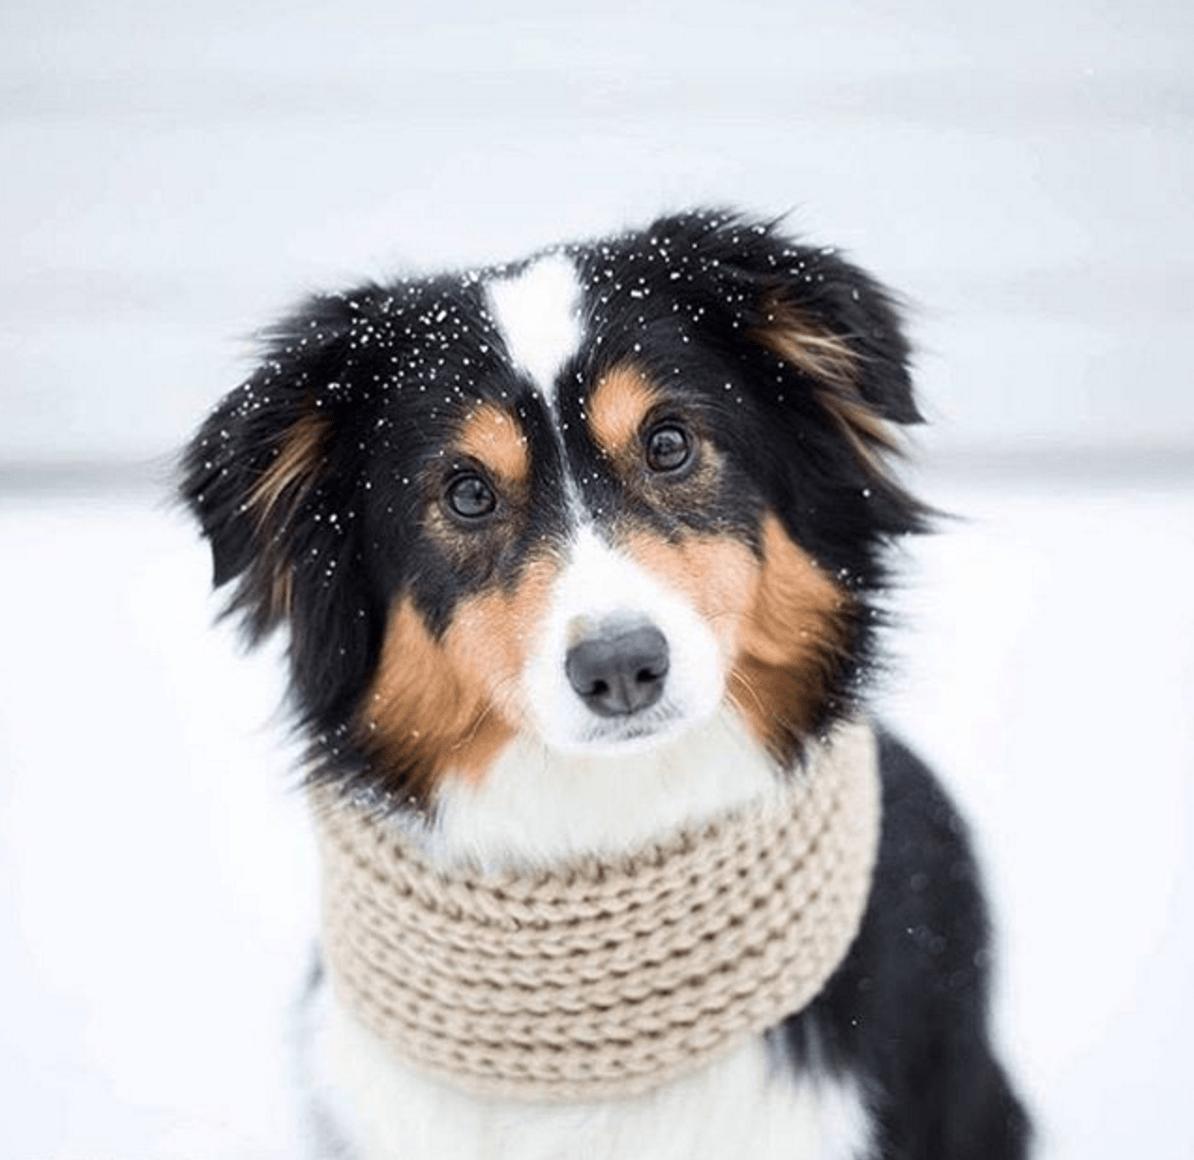 infinity oatmeal dog scarf by Fab Dog